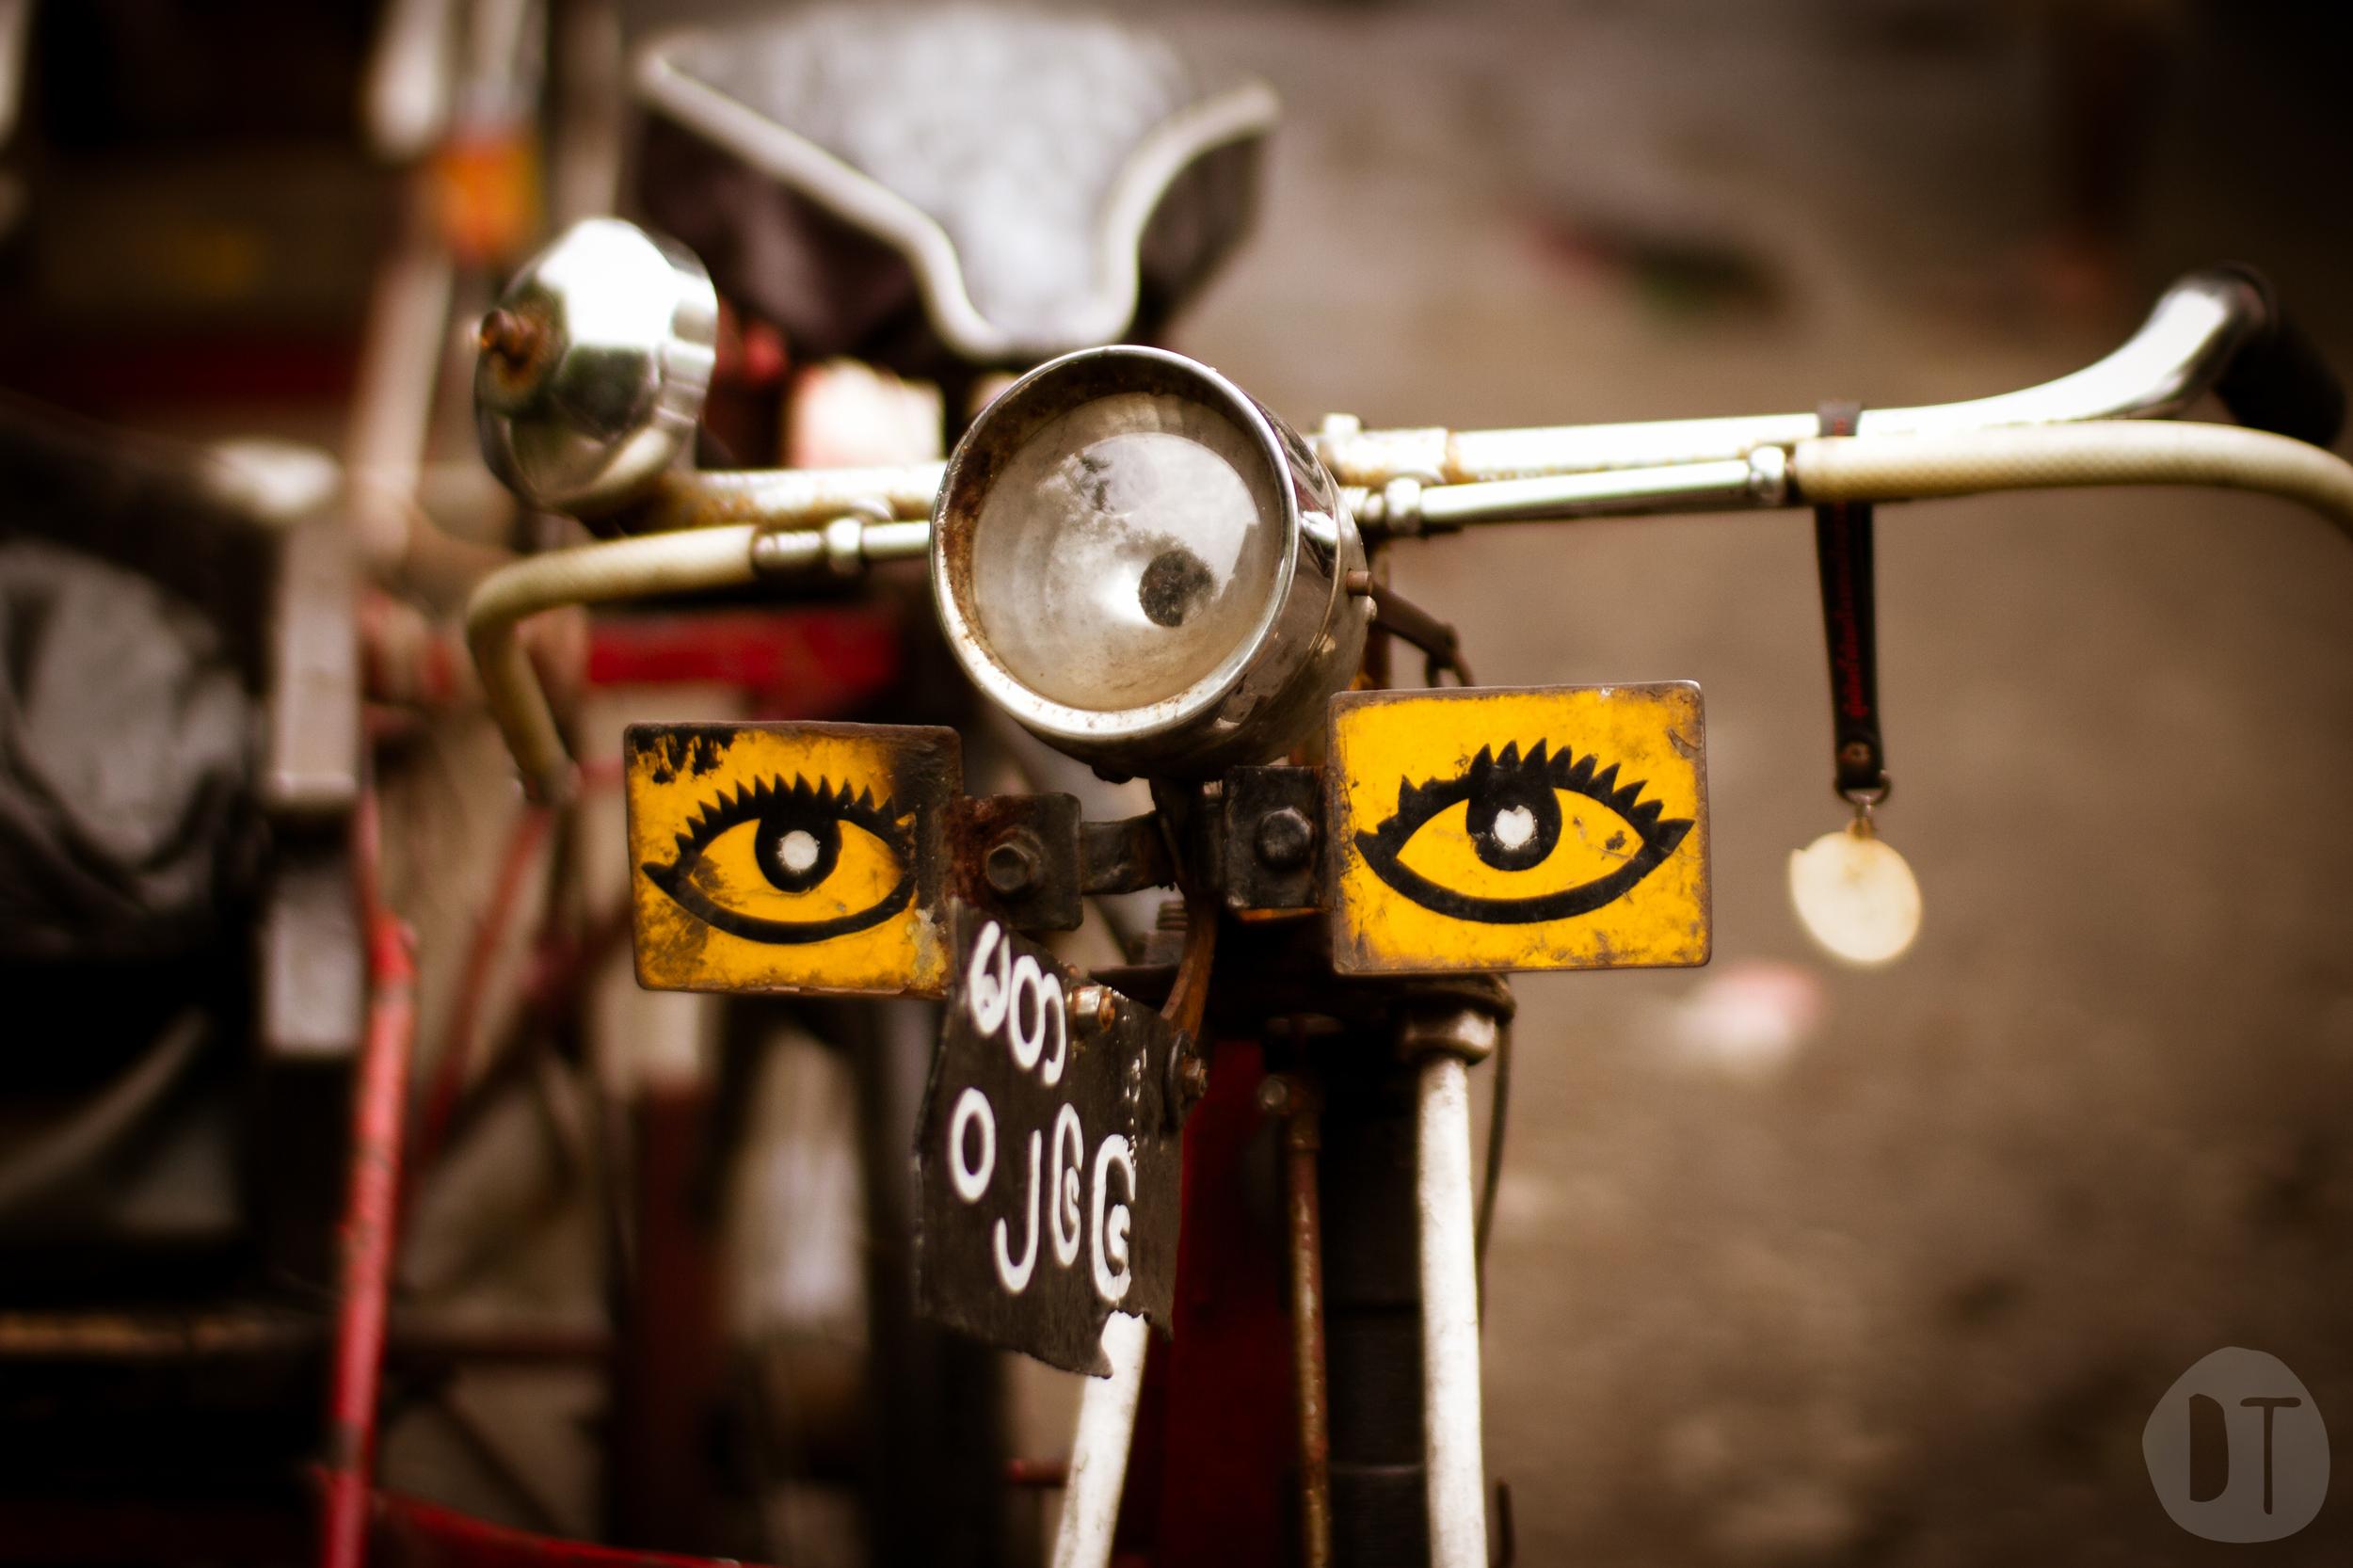 Bike friendly.